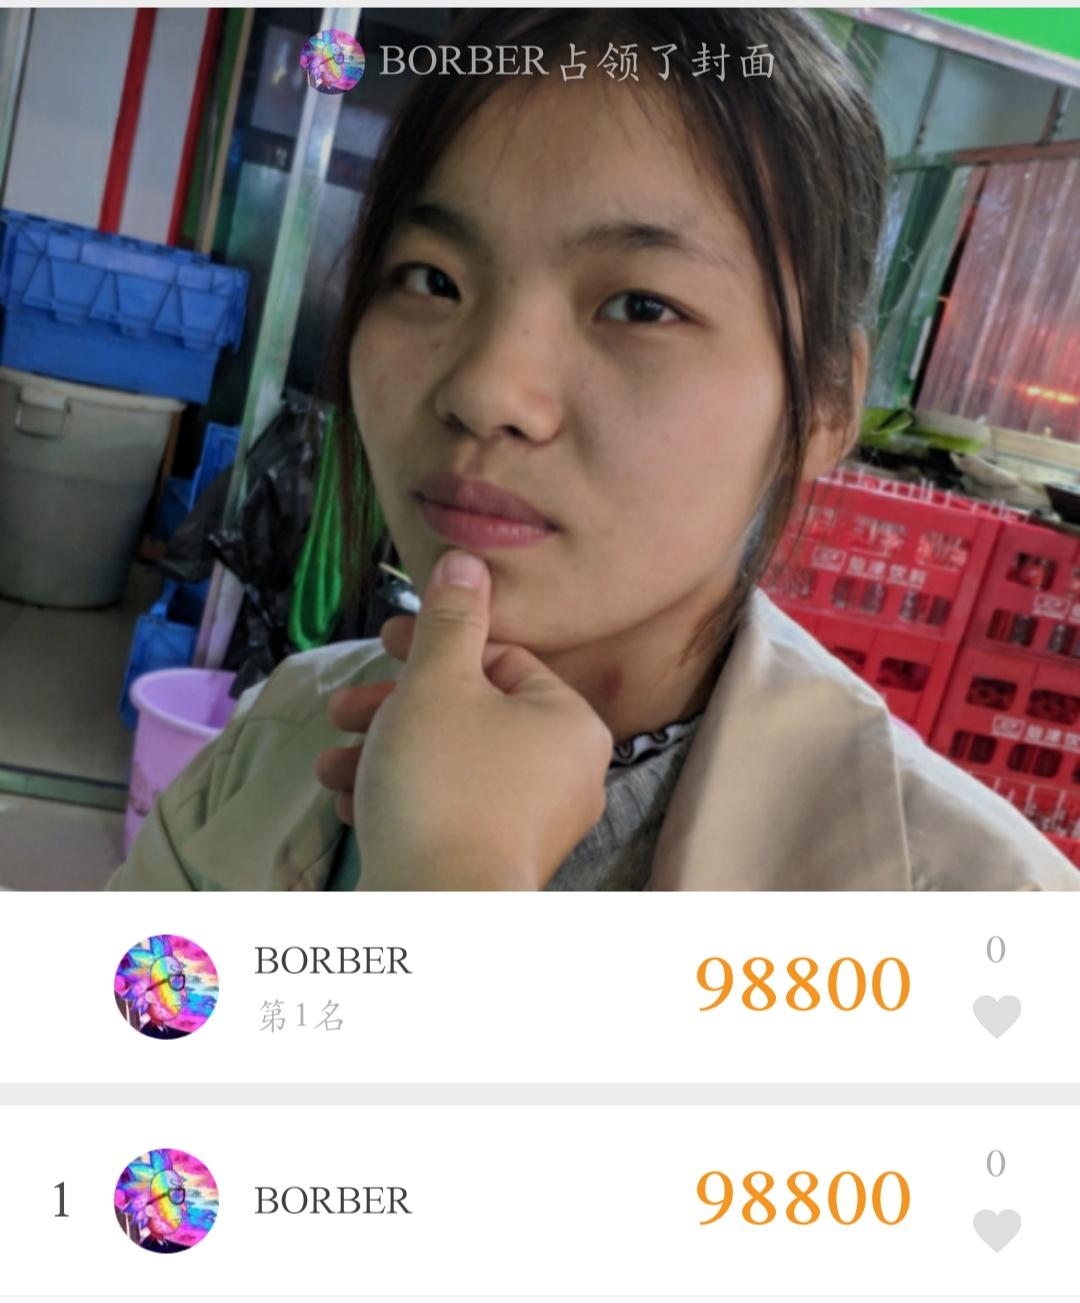 Screenshot_2019-08-26-10-52-47-183_com.tencent.mm.jpg